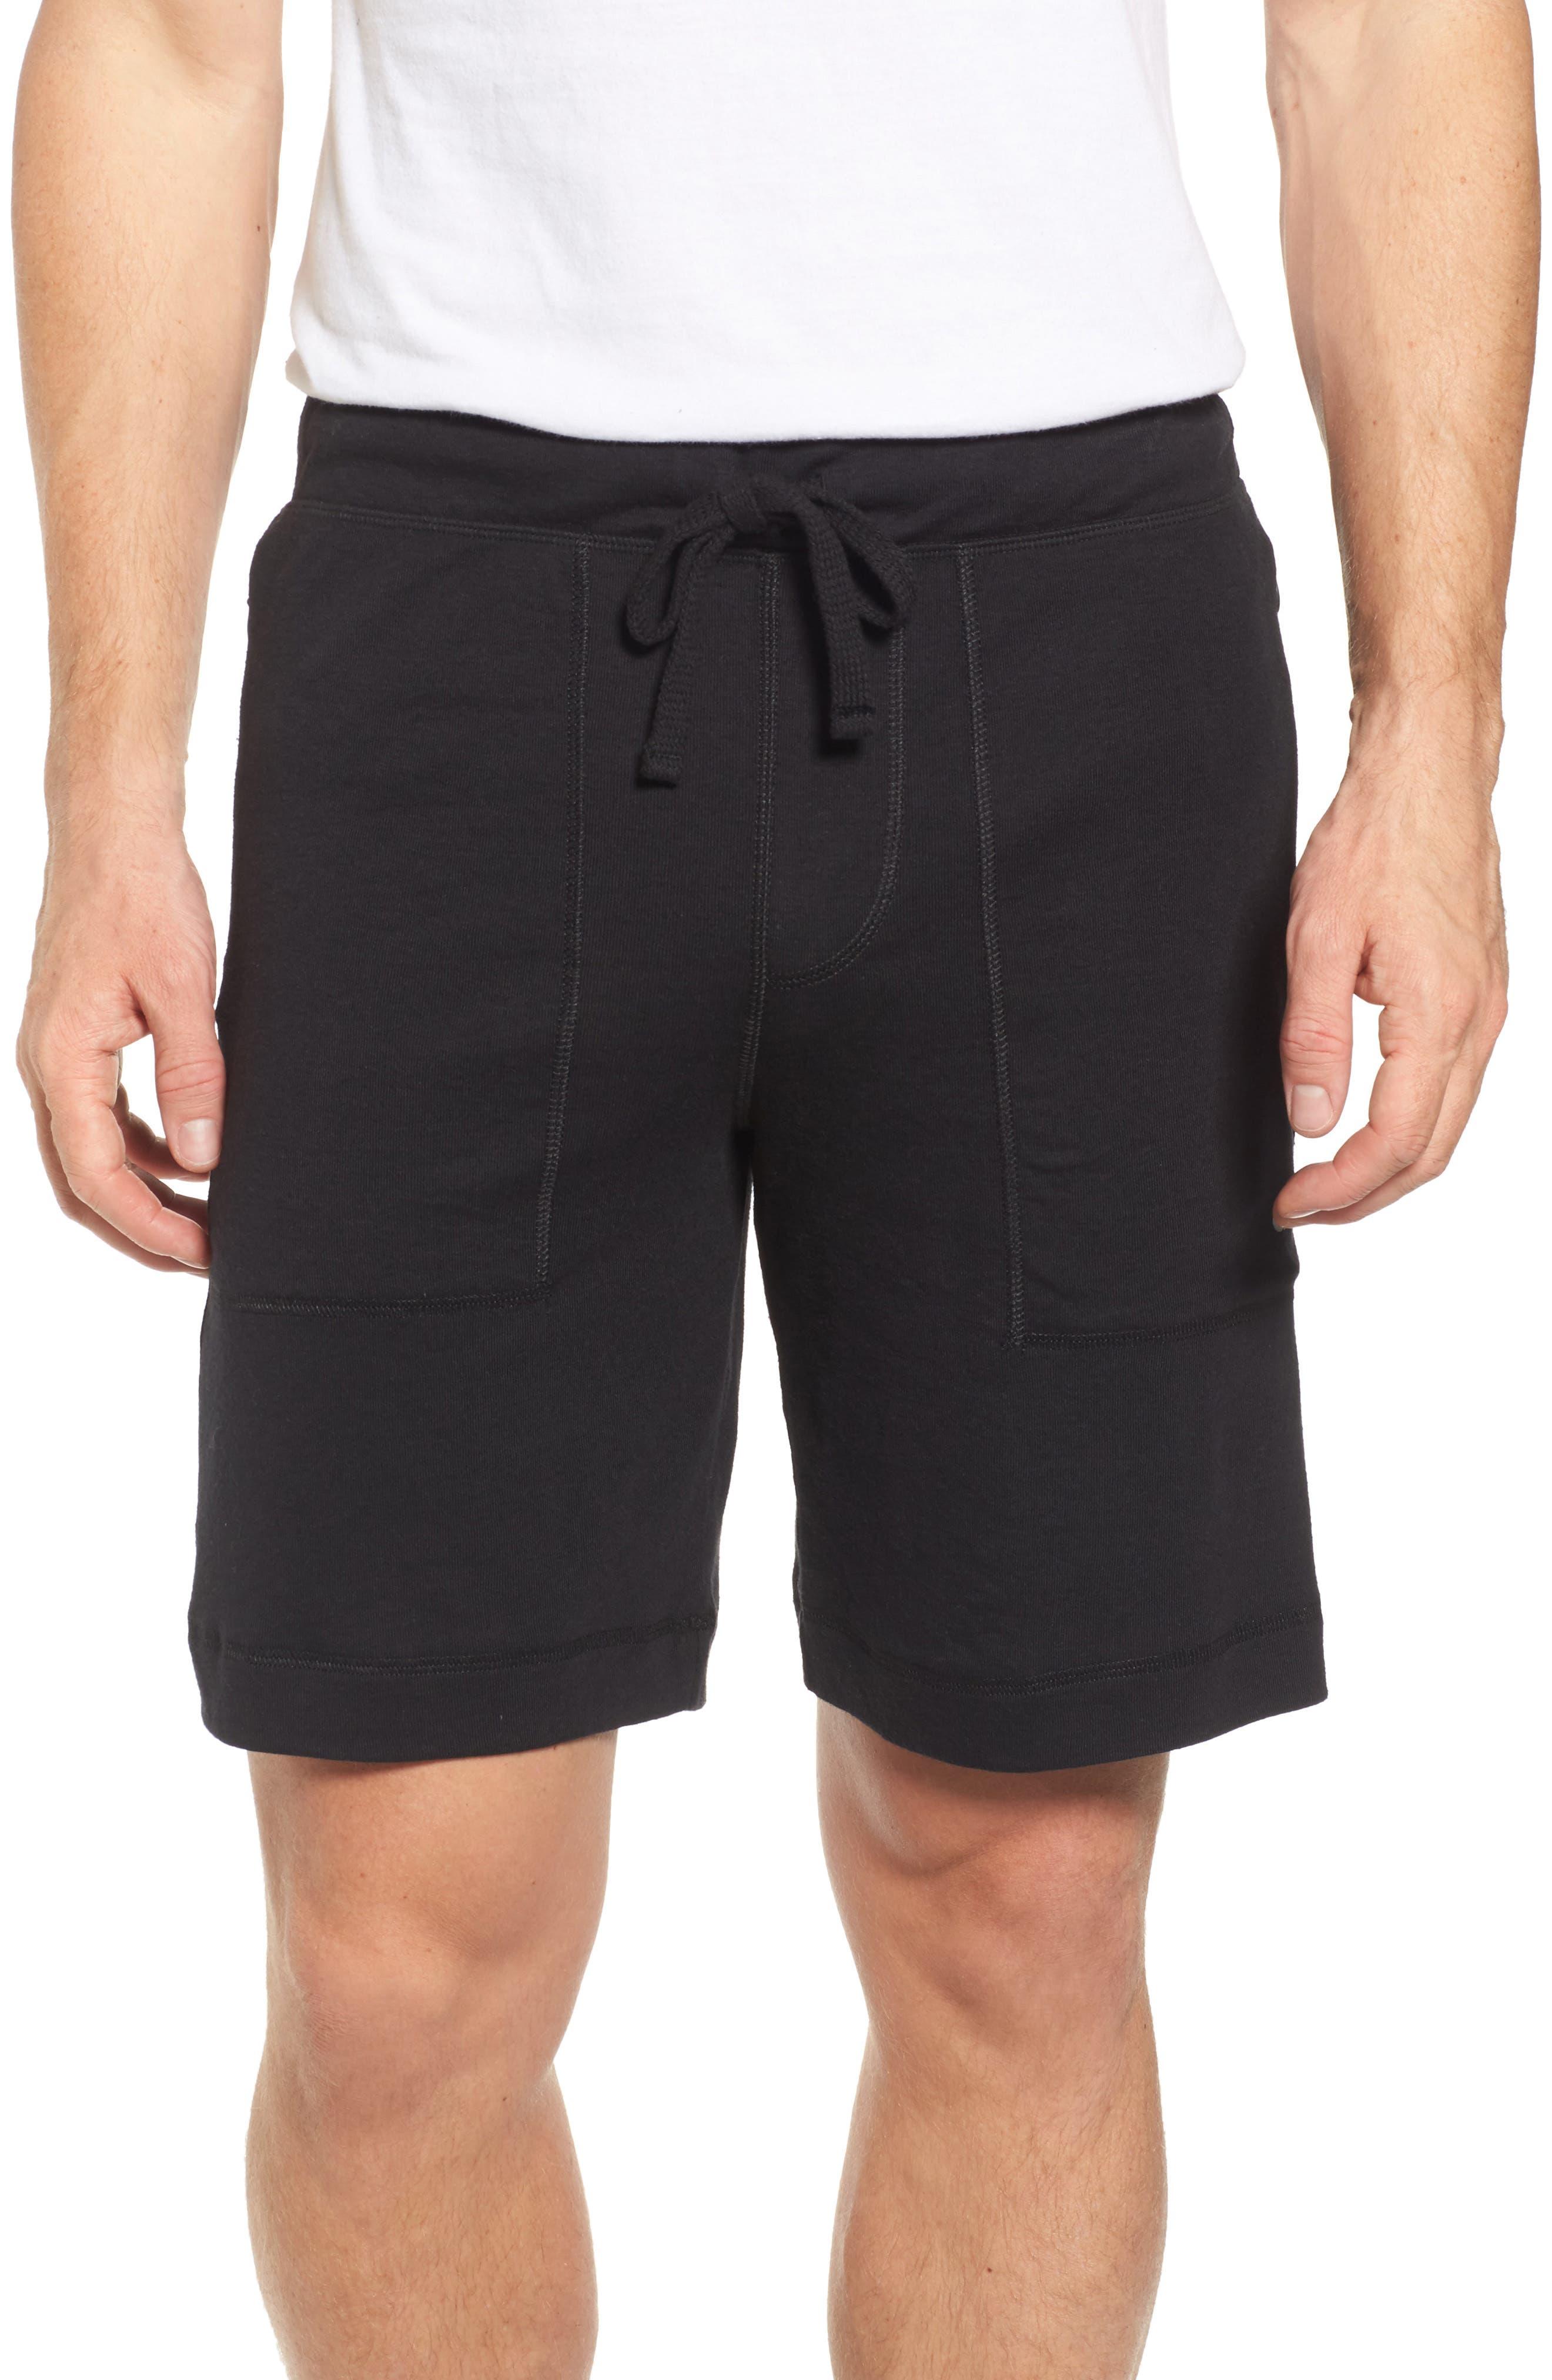 Main Image - Alo Revival Relaxed Knit Shorts